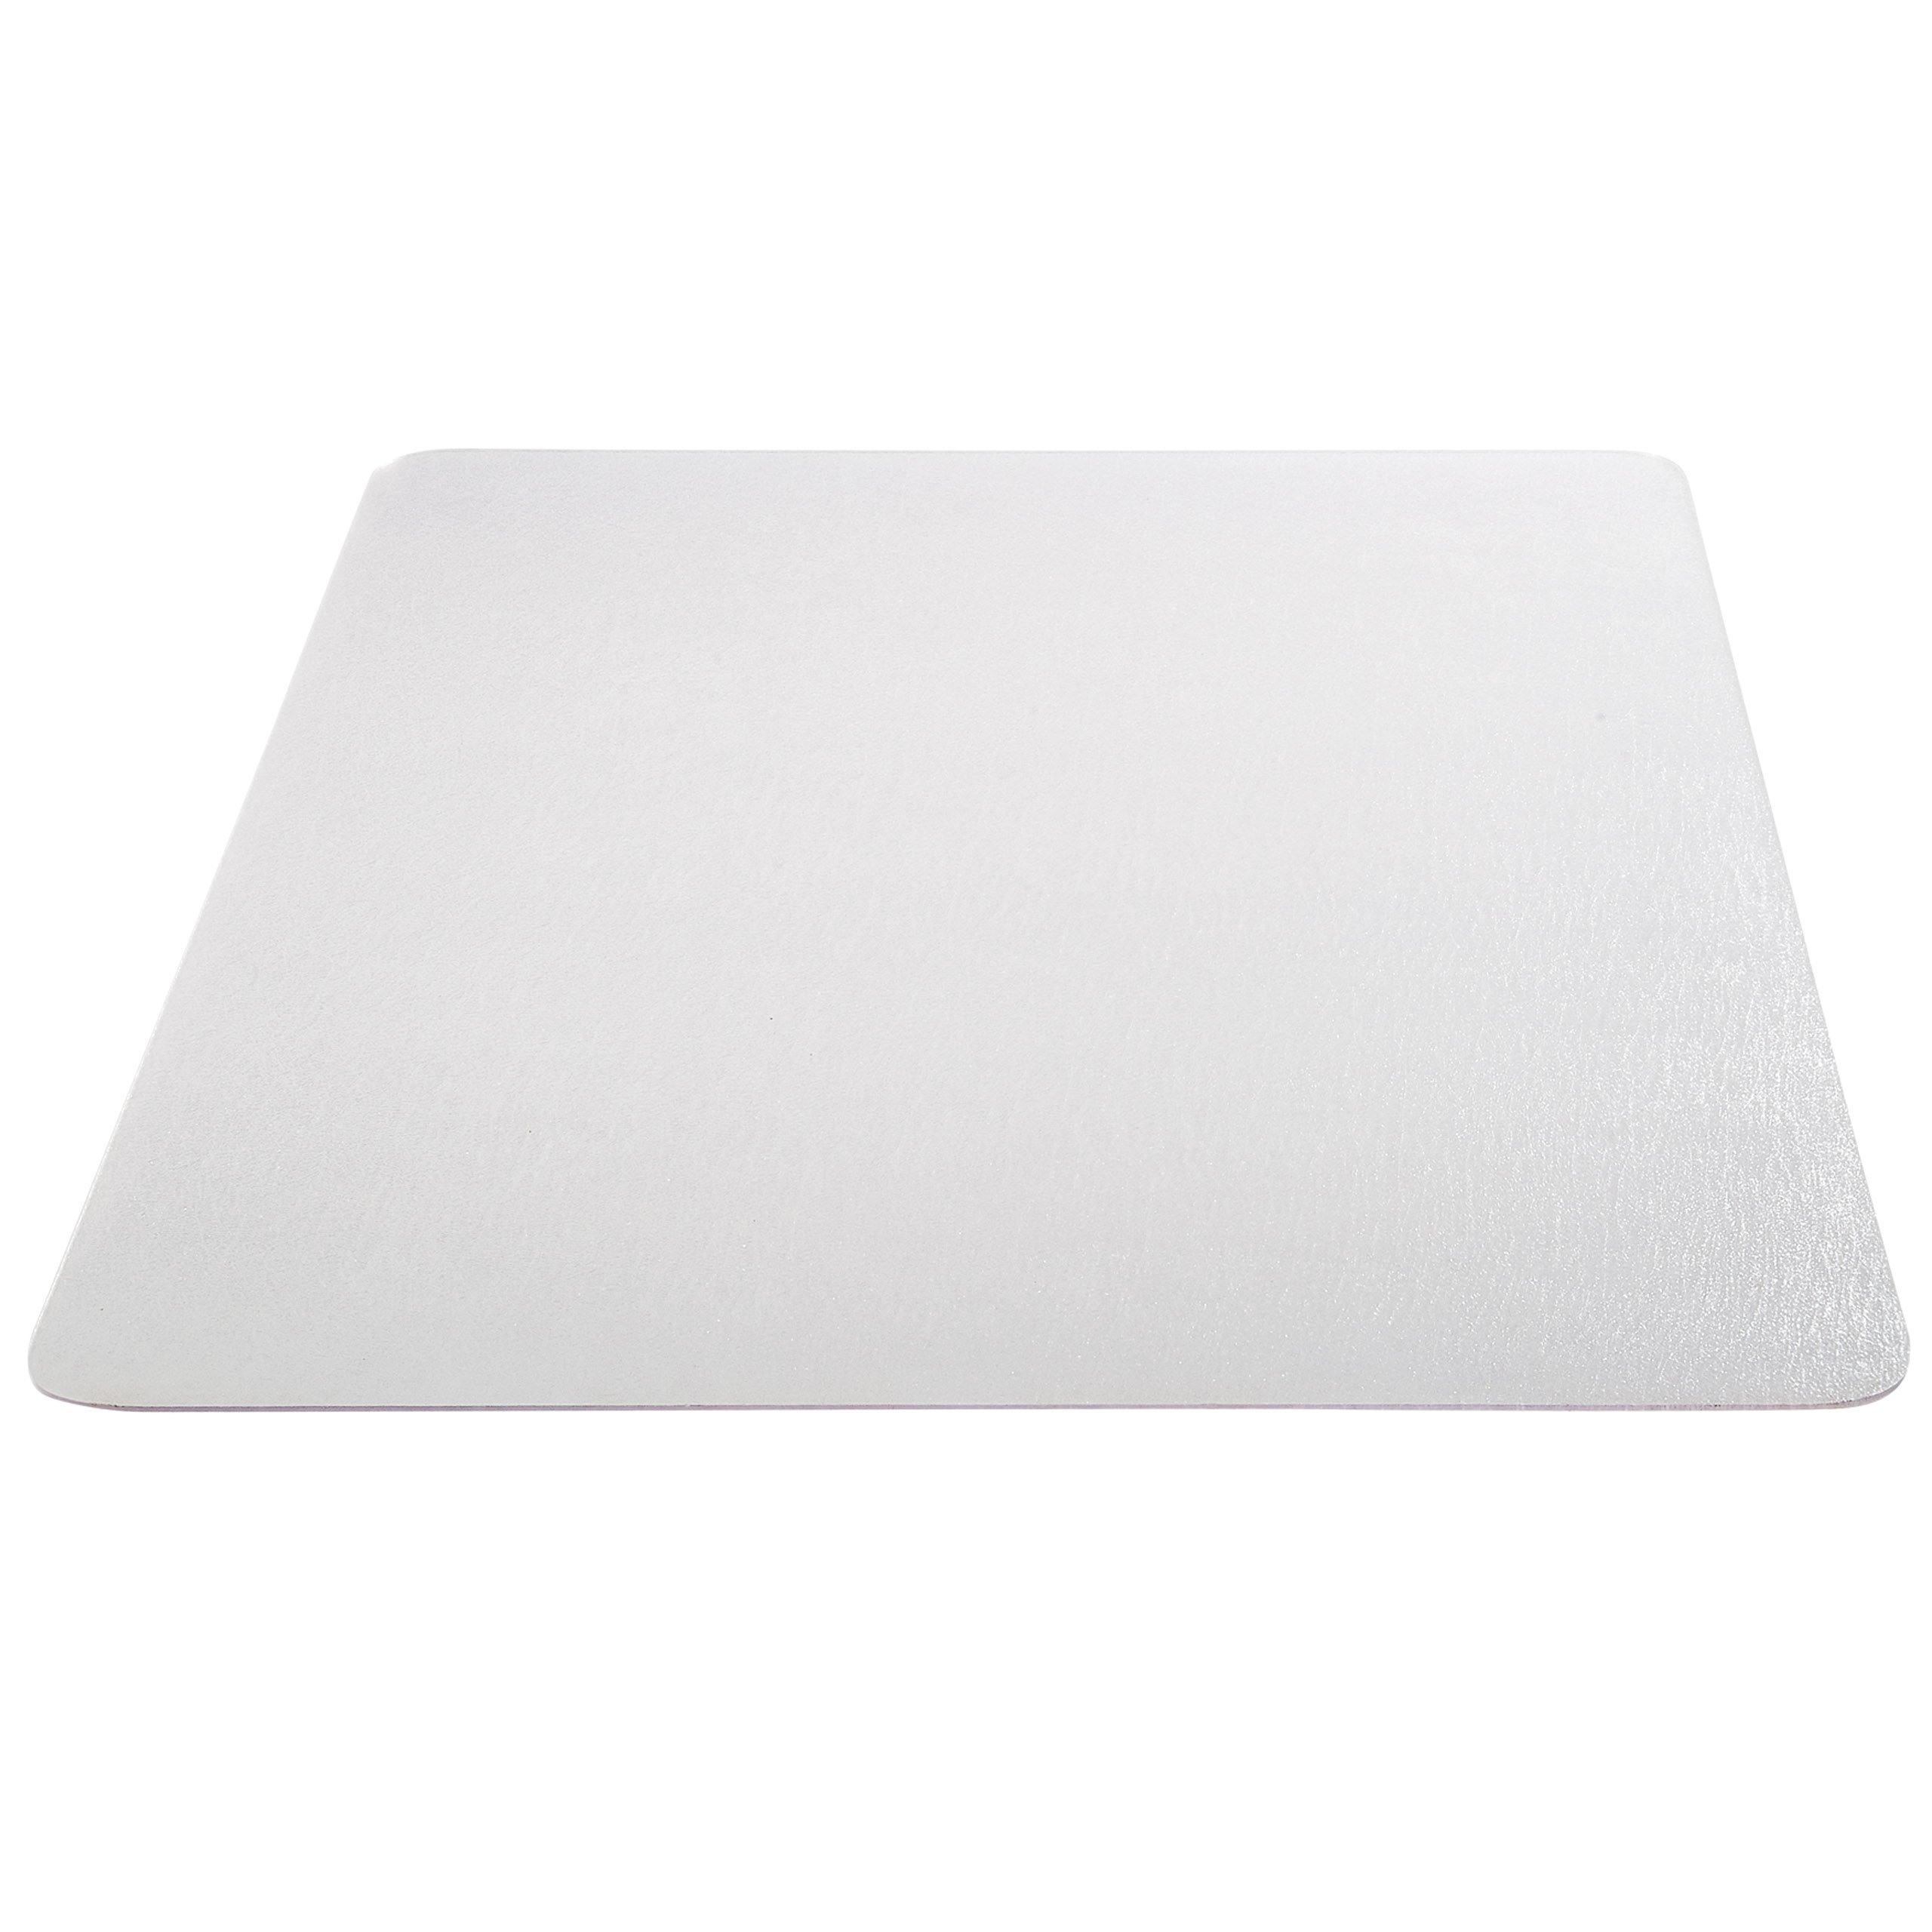 Deflecto EconoMat Clear Chair Mat, Hard Floor Use, Rectangle, Straight Edge, 46'' x 60'', Clear (CM2E442FCOM) (Renewed)